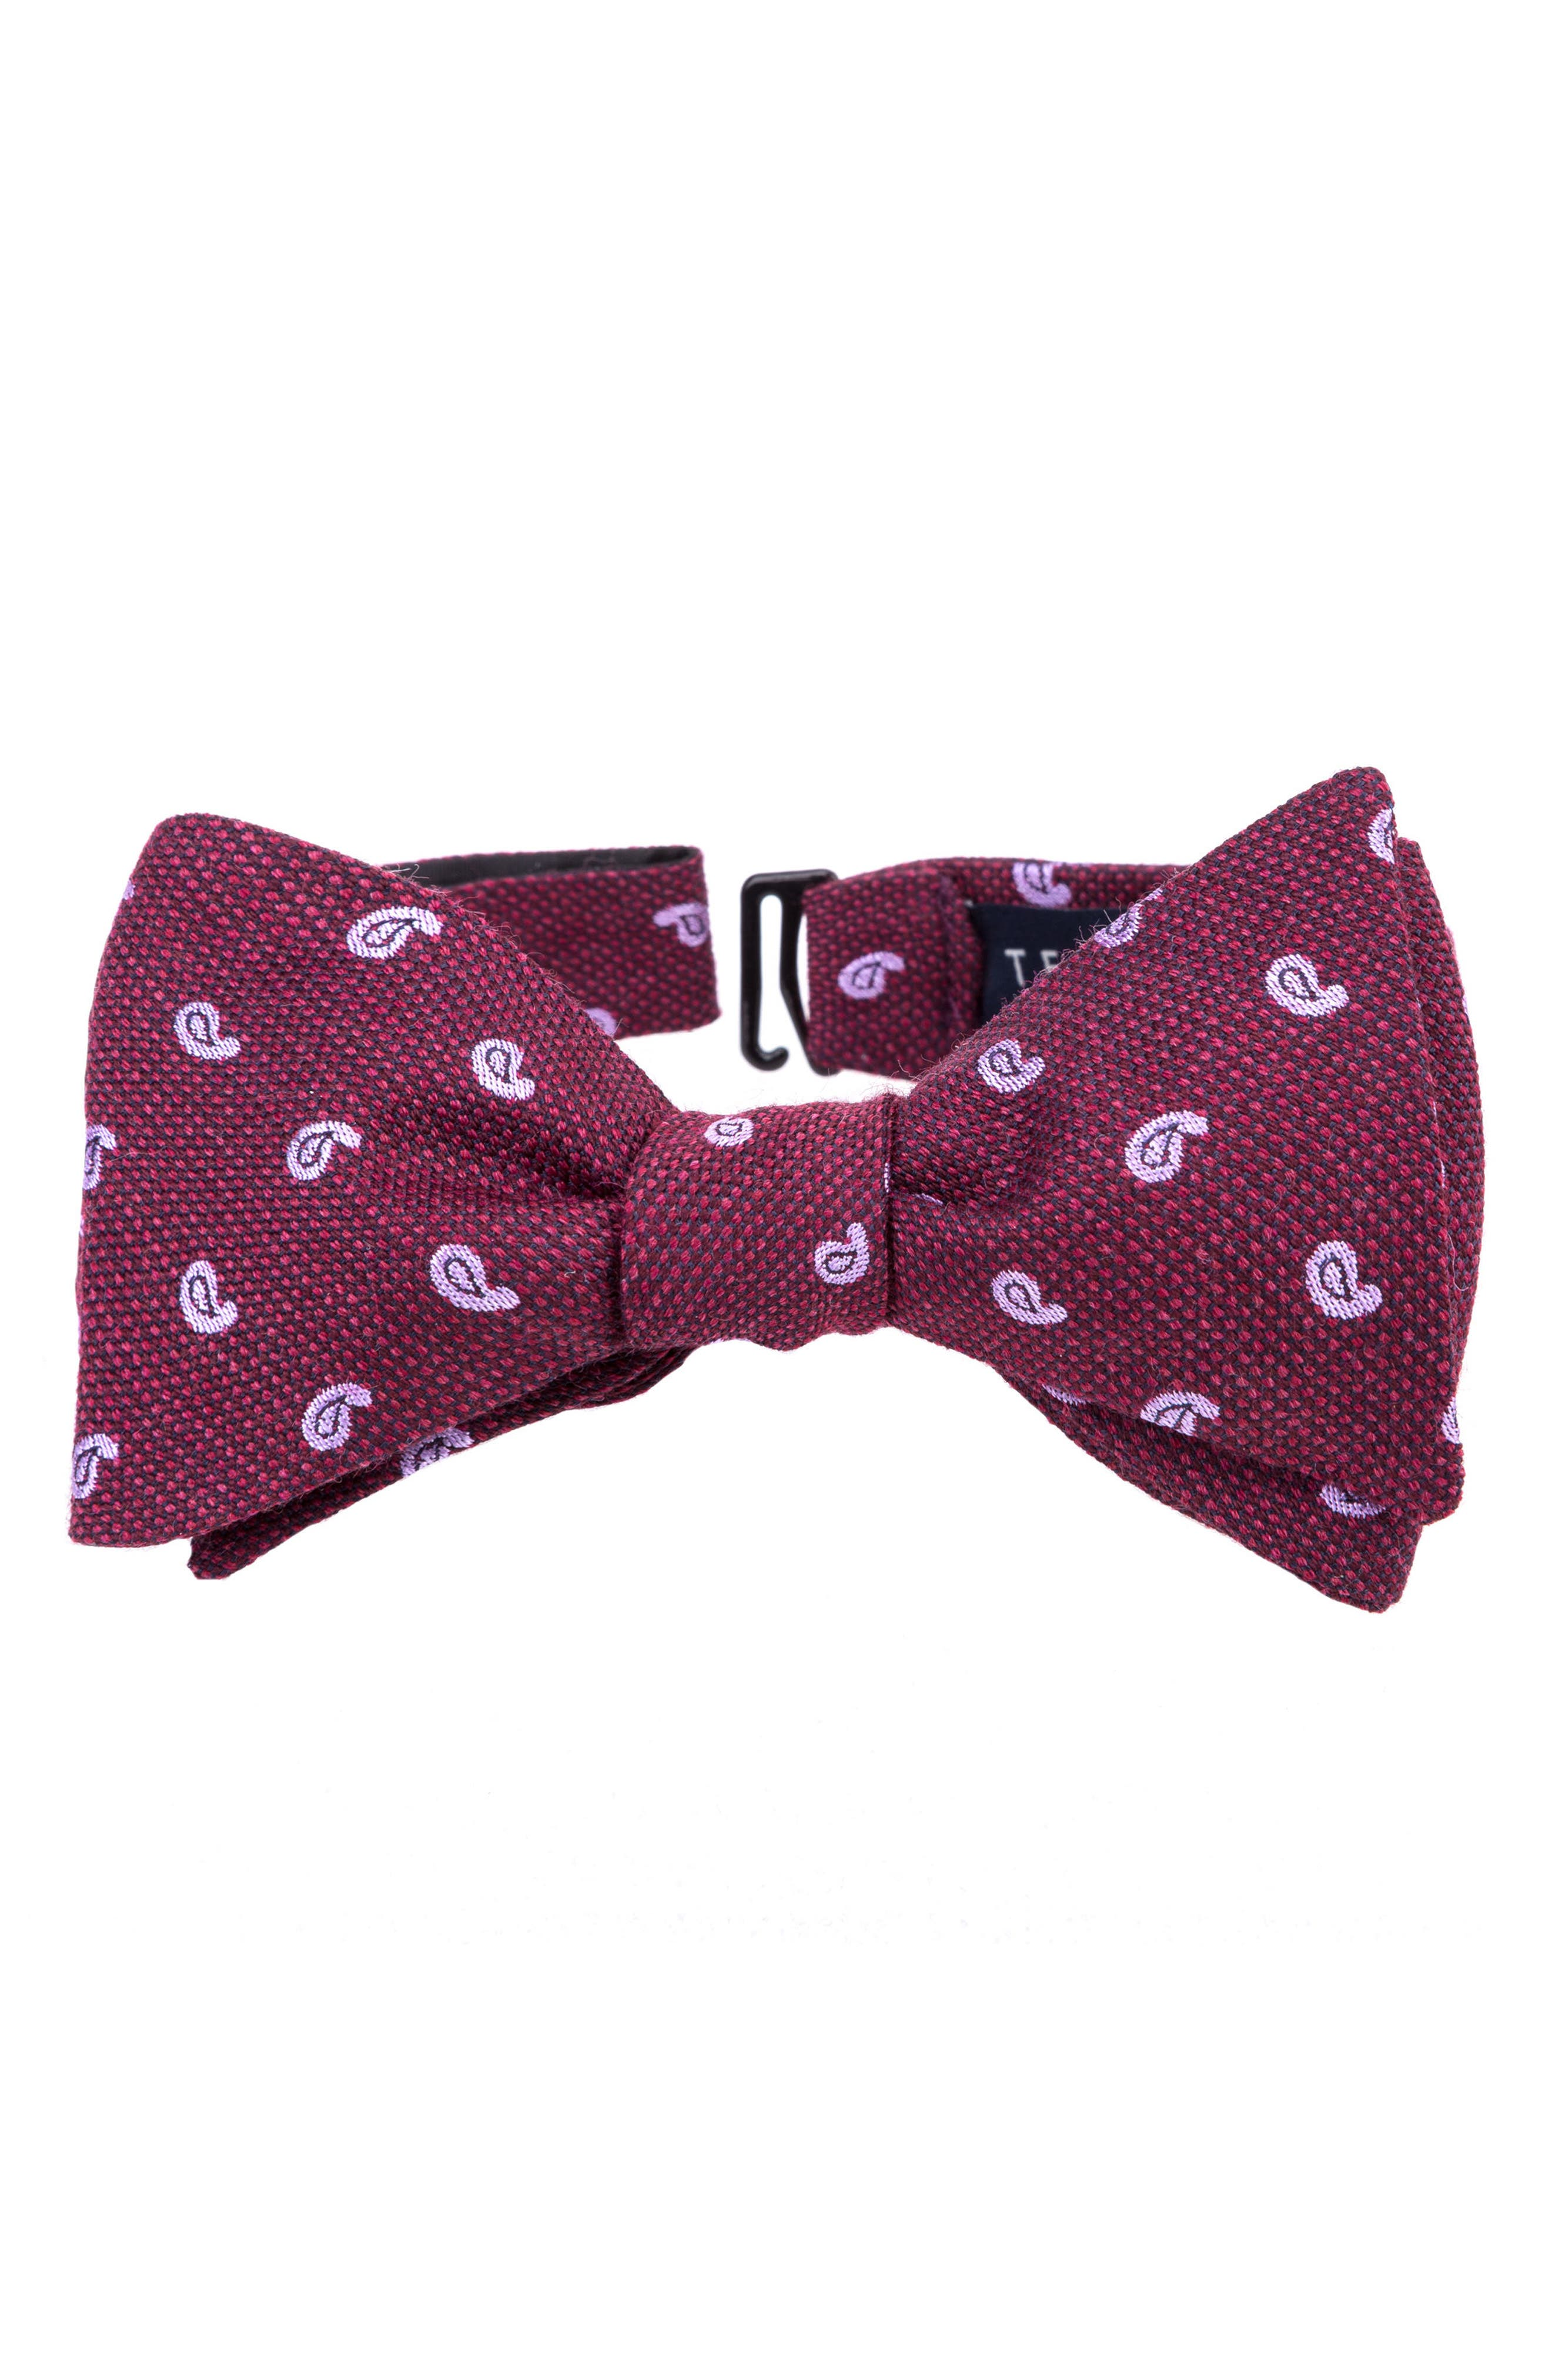 Main Image - Ted Baker London Paisley Silk & Wool Bow Tie